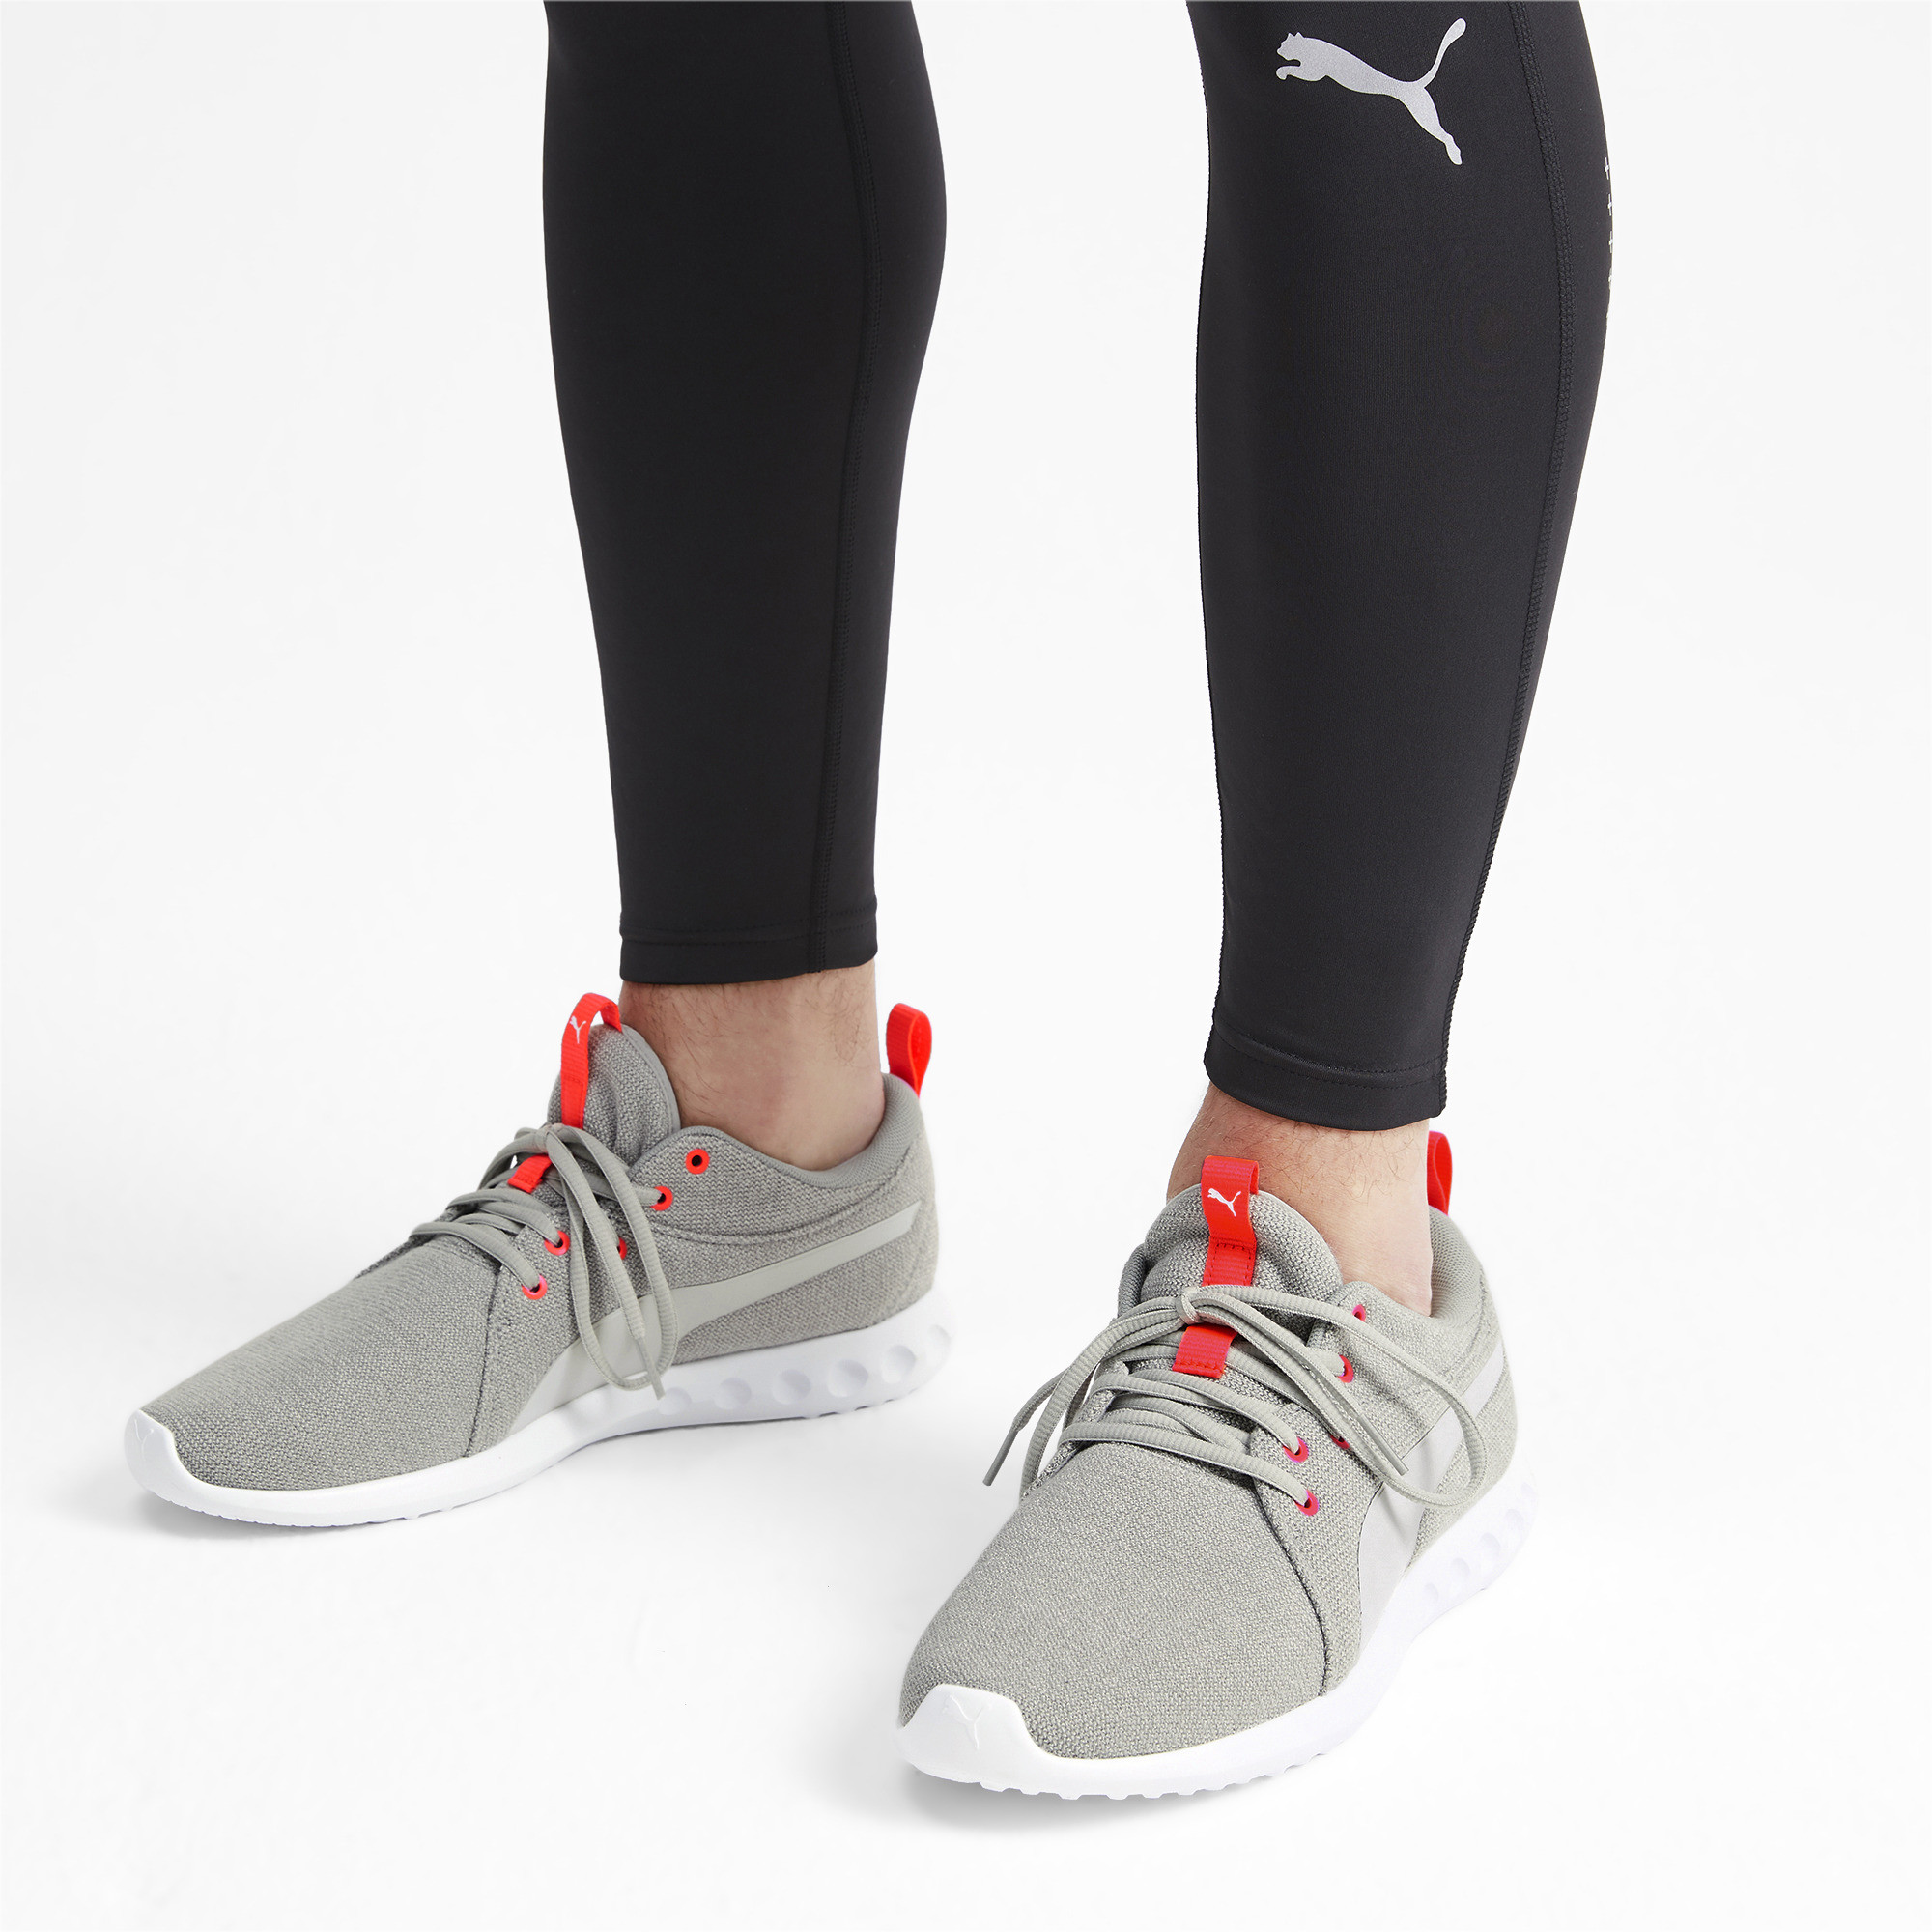 PUMA-Carson-2-Knit-Men-039-s-Training-Shoes-Men-Shoe-Running thumbnail 13